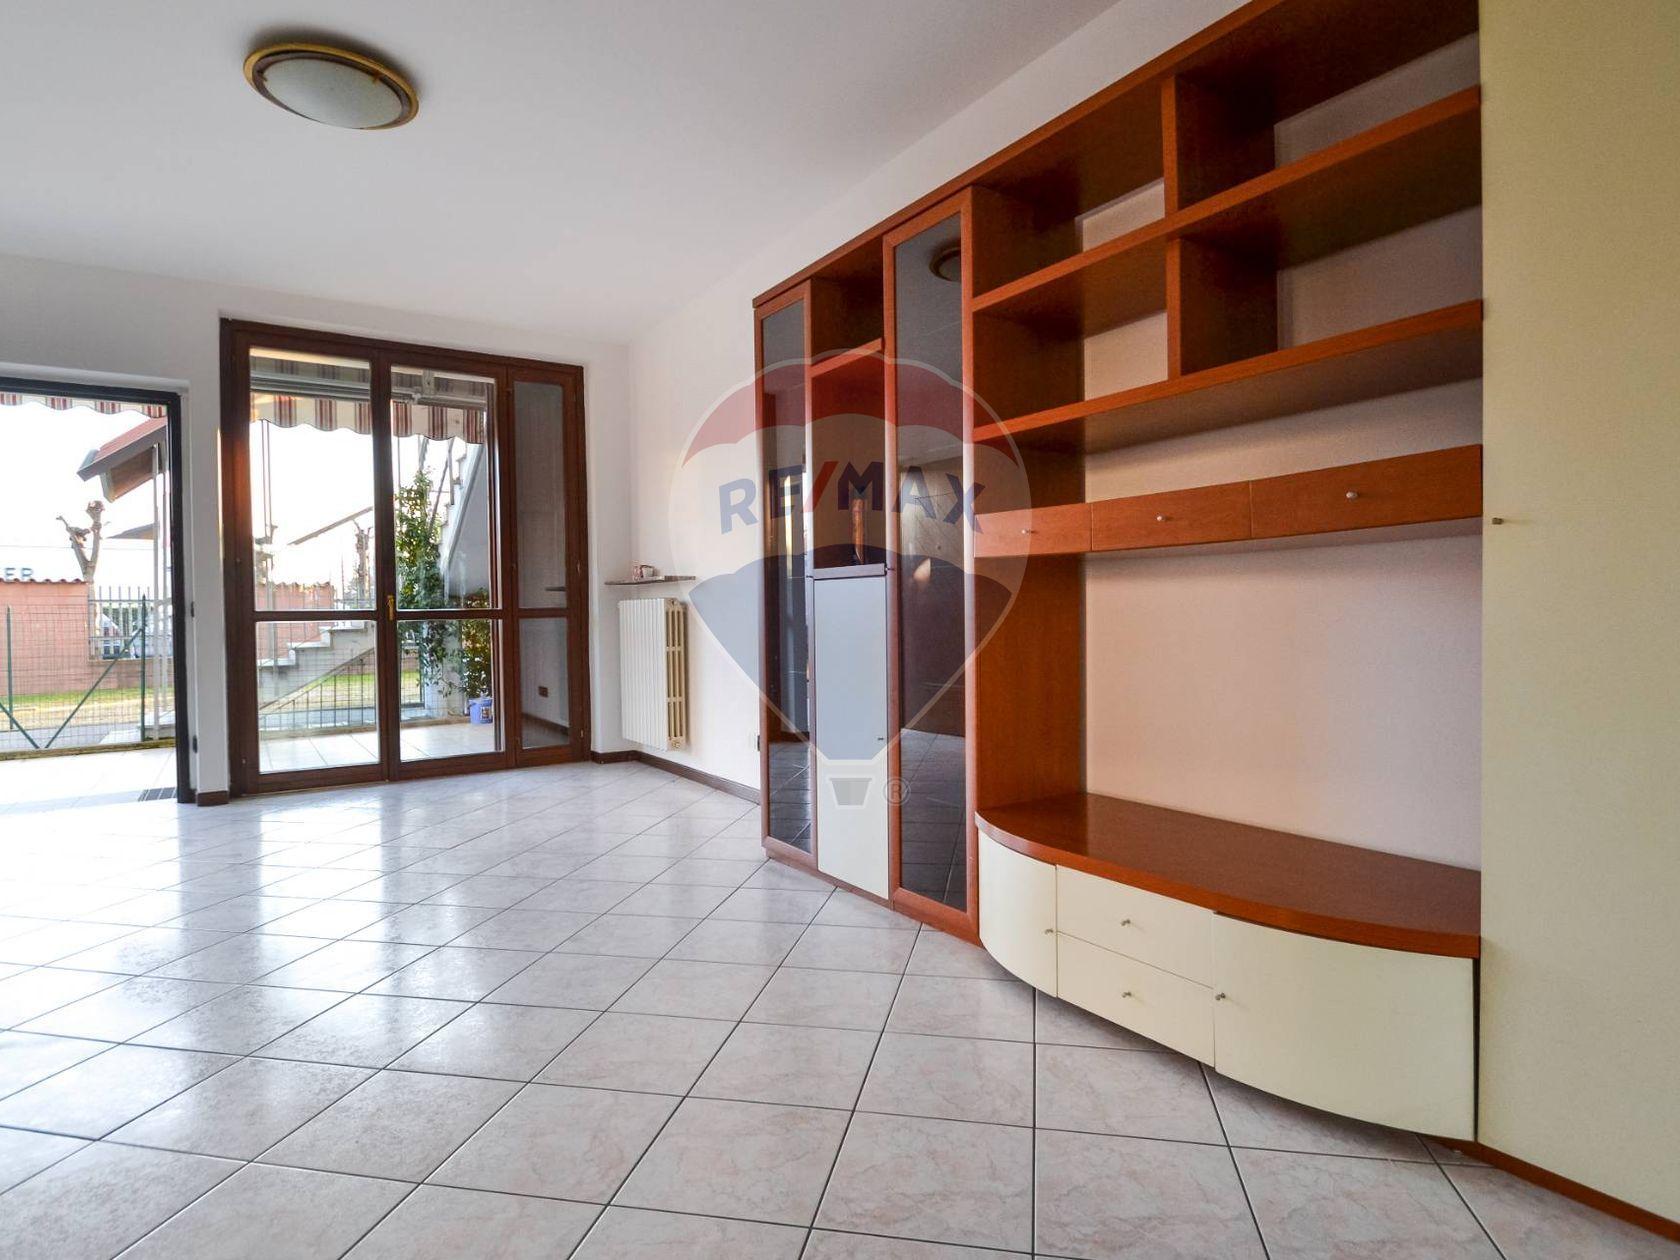 Appartamento Ciserano, BG Vendita - Foto 7